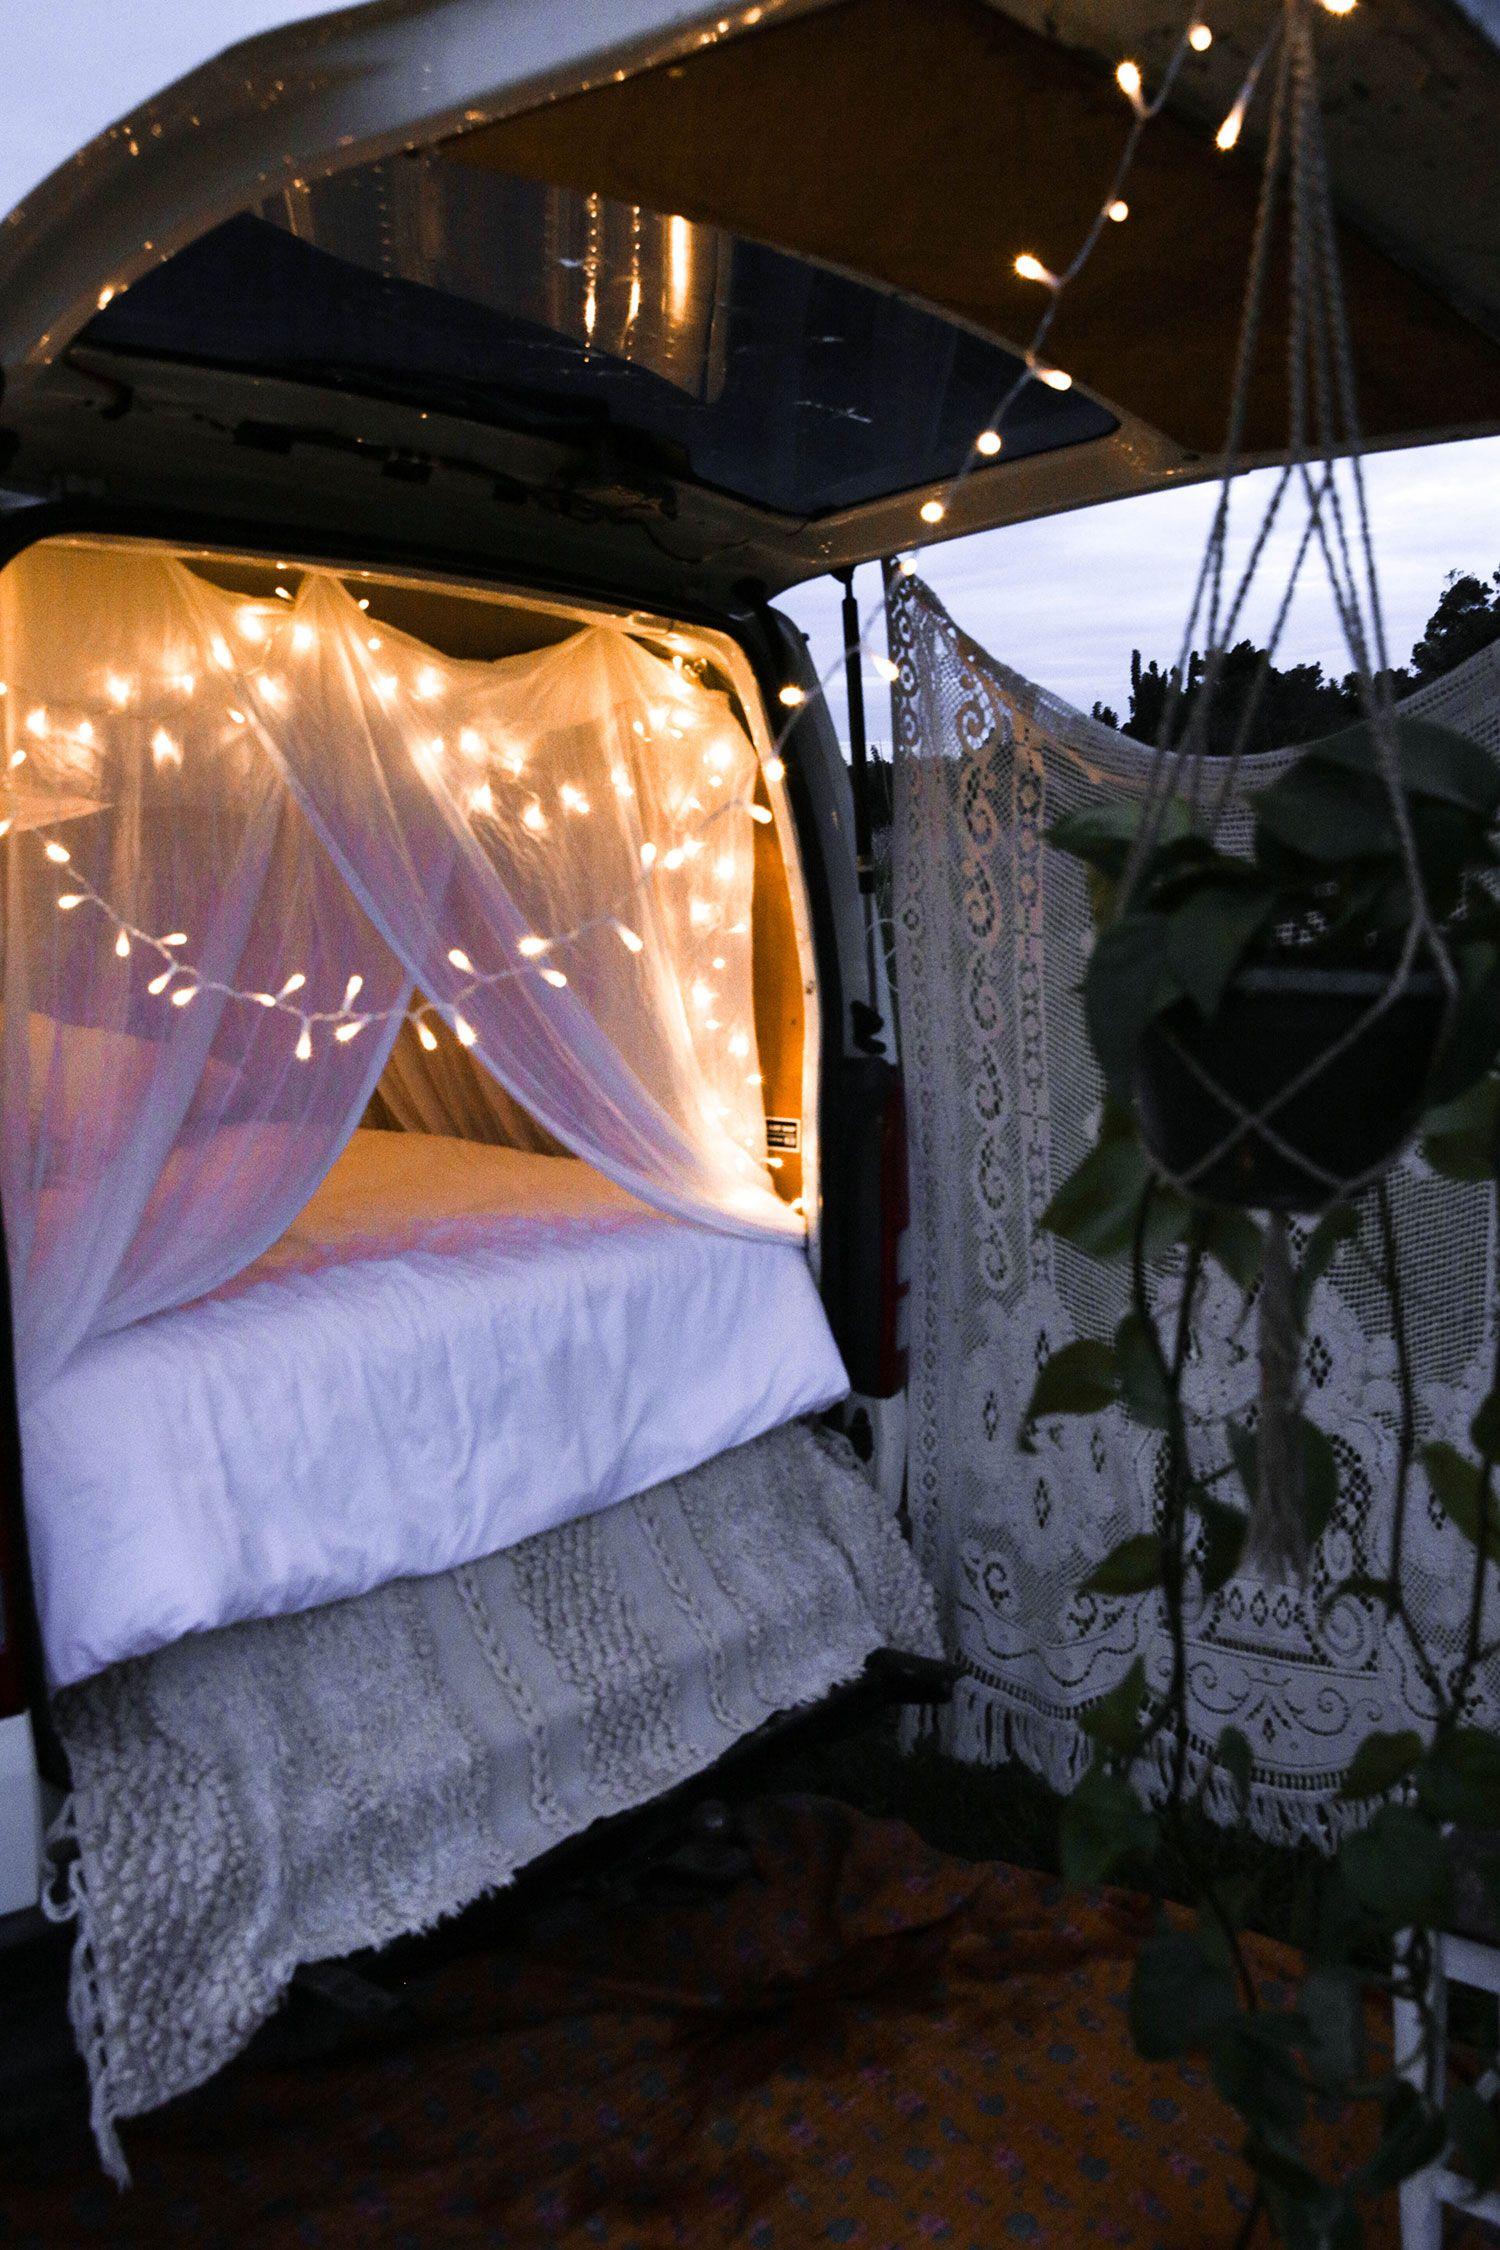 Spell Festival Van Set Up | Bohemia Dreamia | Pinterest | Spaces ...